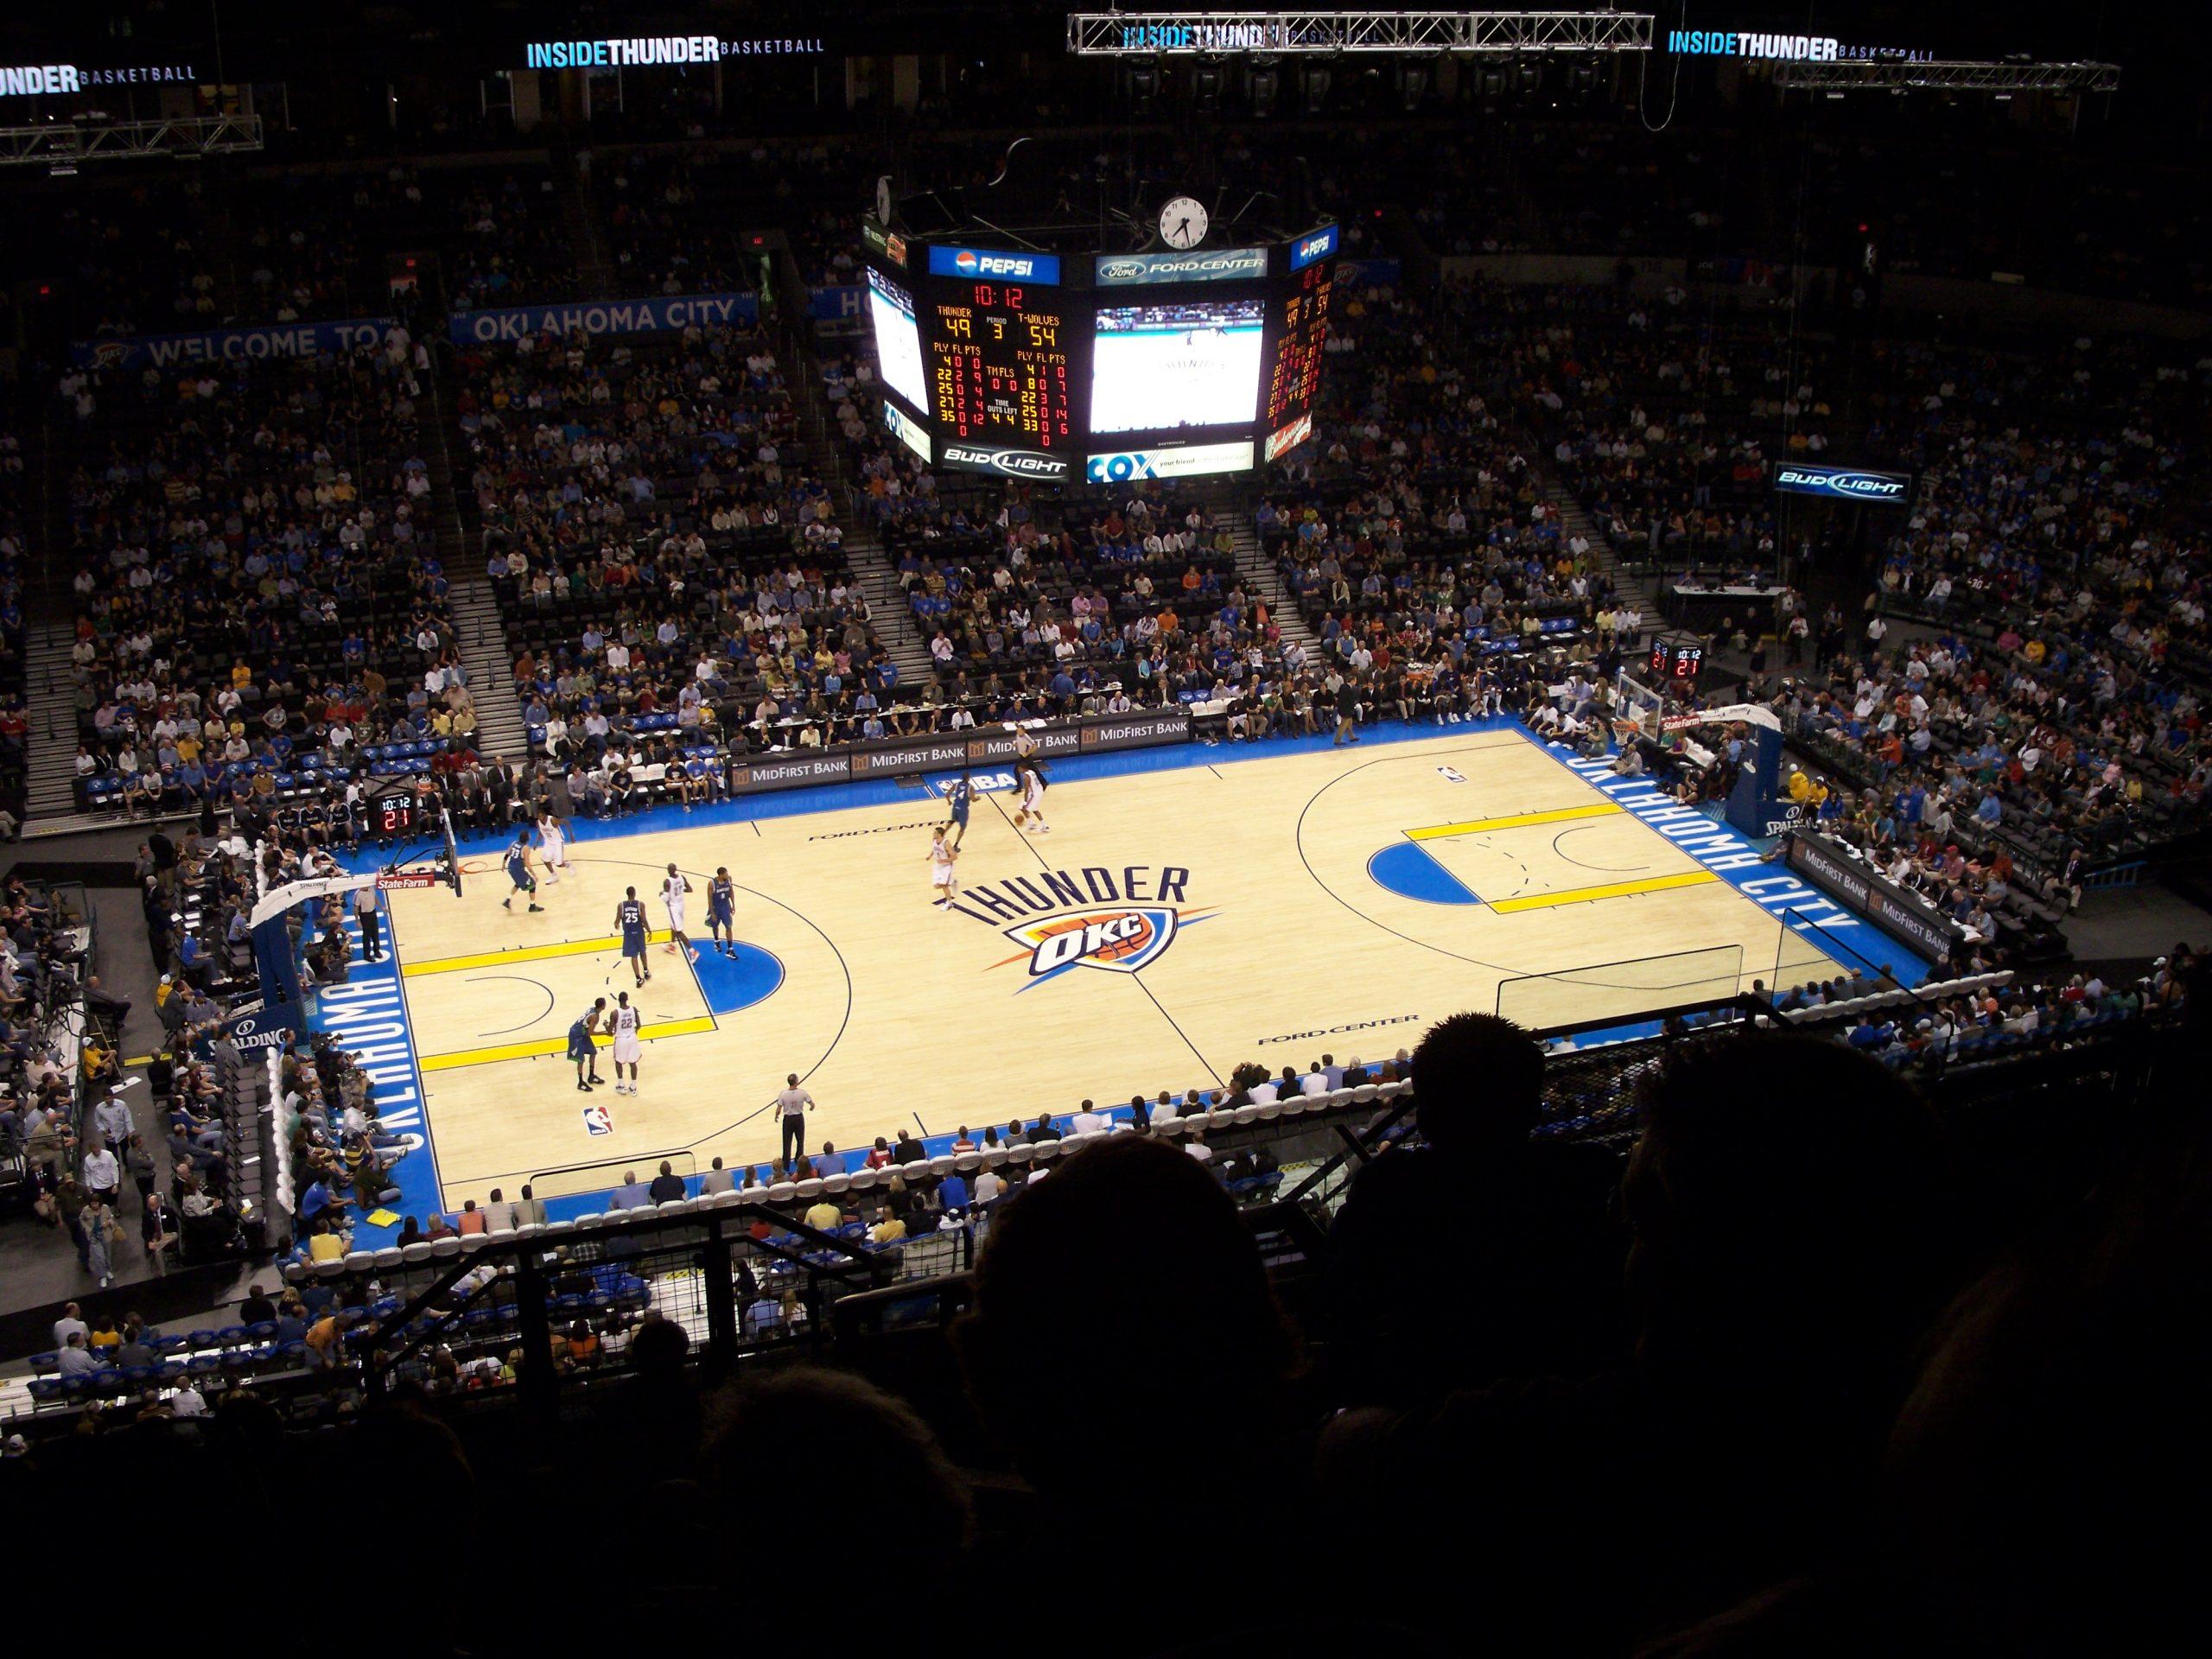 Chesapeake Energy Arena Interior